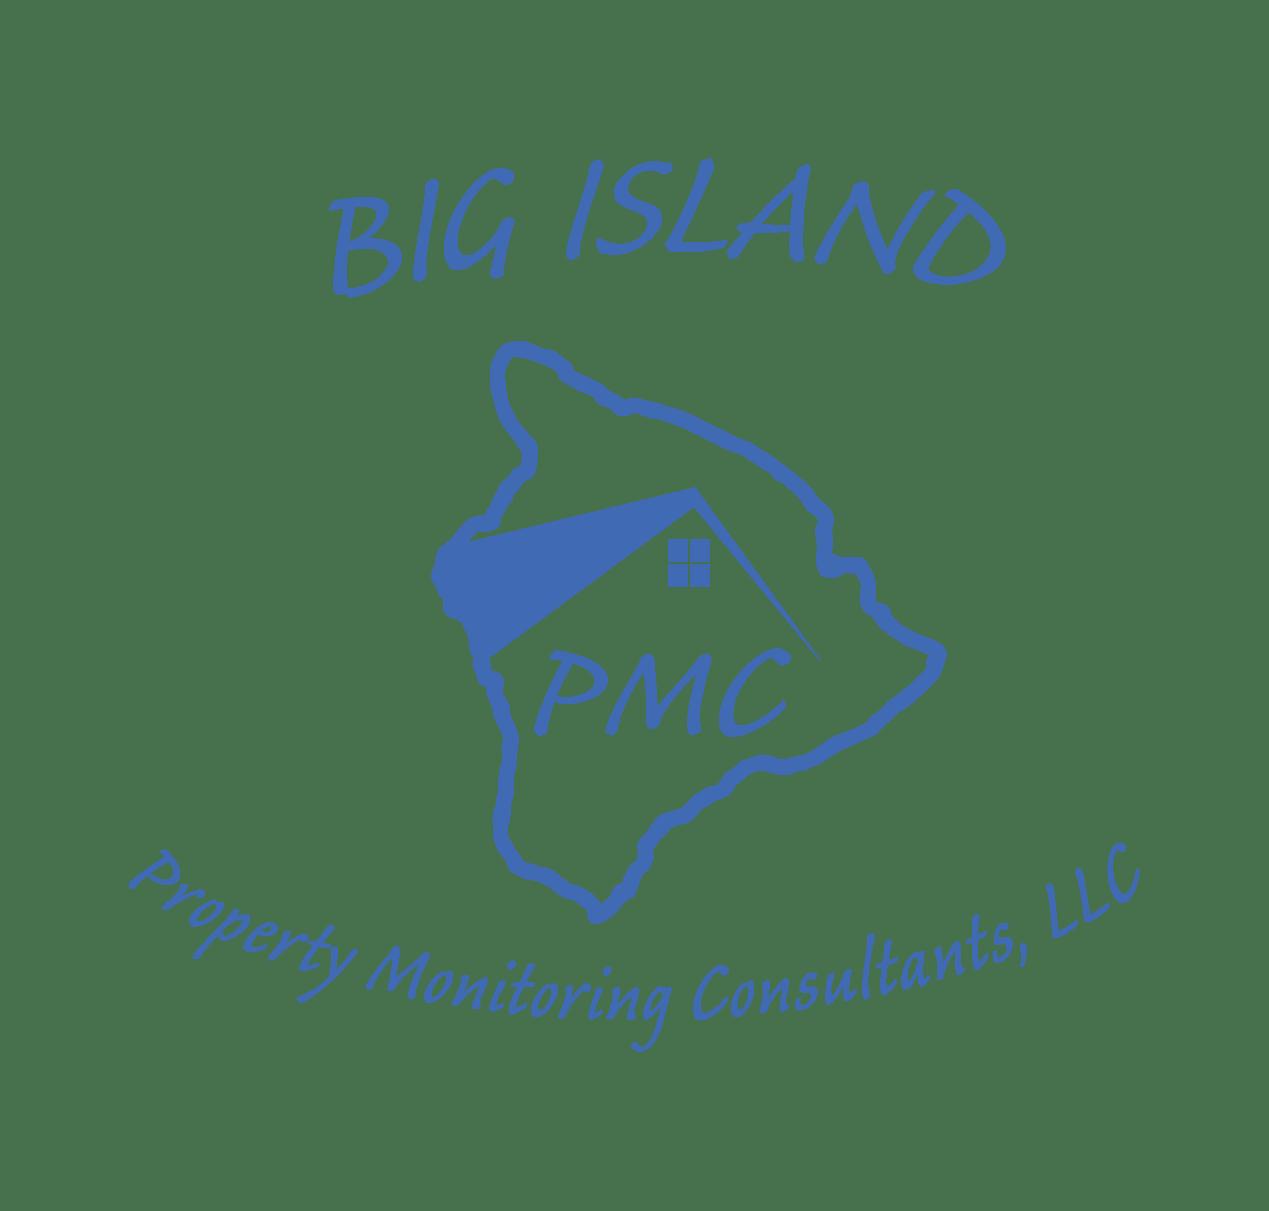 Big Island Property Monitoring Consultants